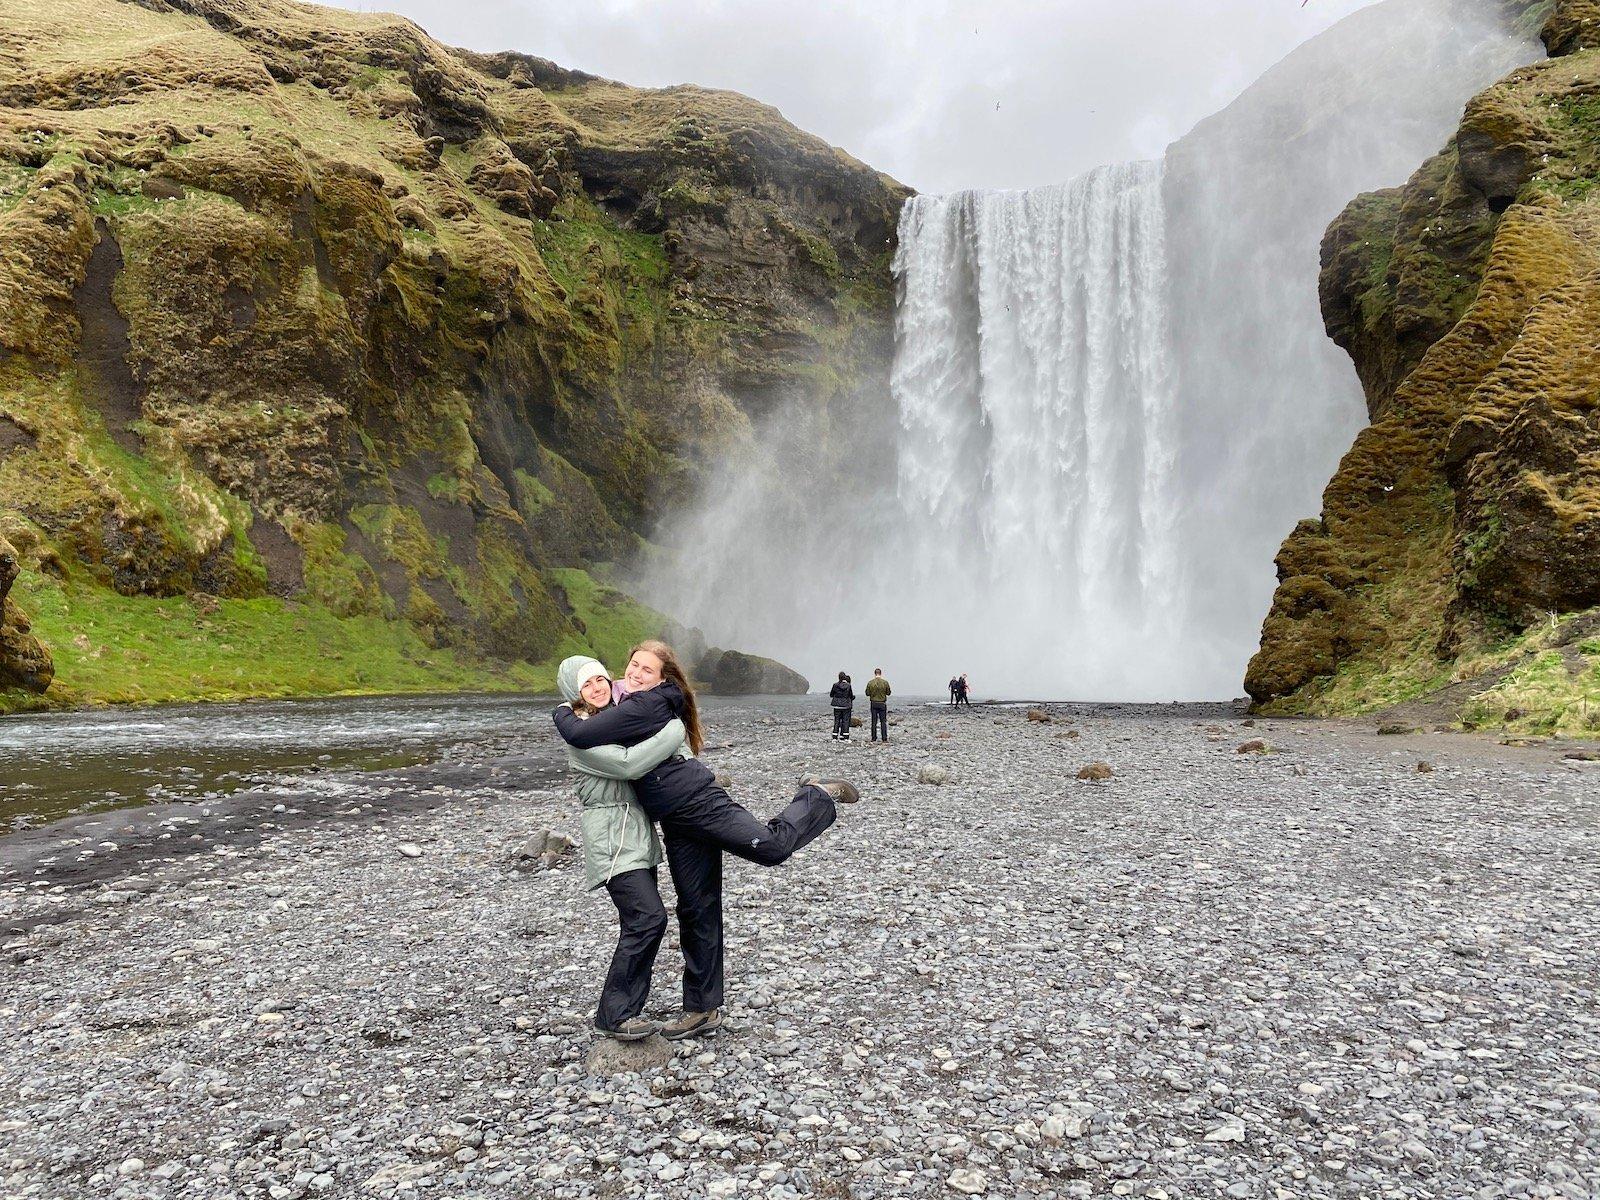 Sisters posing at Skógafoss Falls near Vik in Iceland.